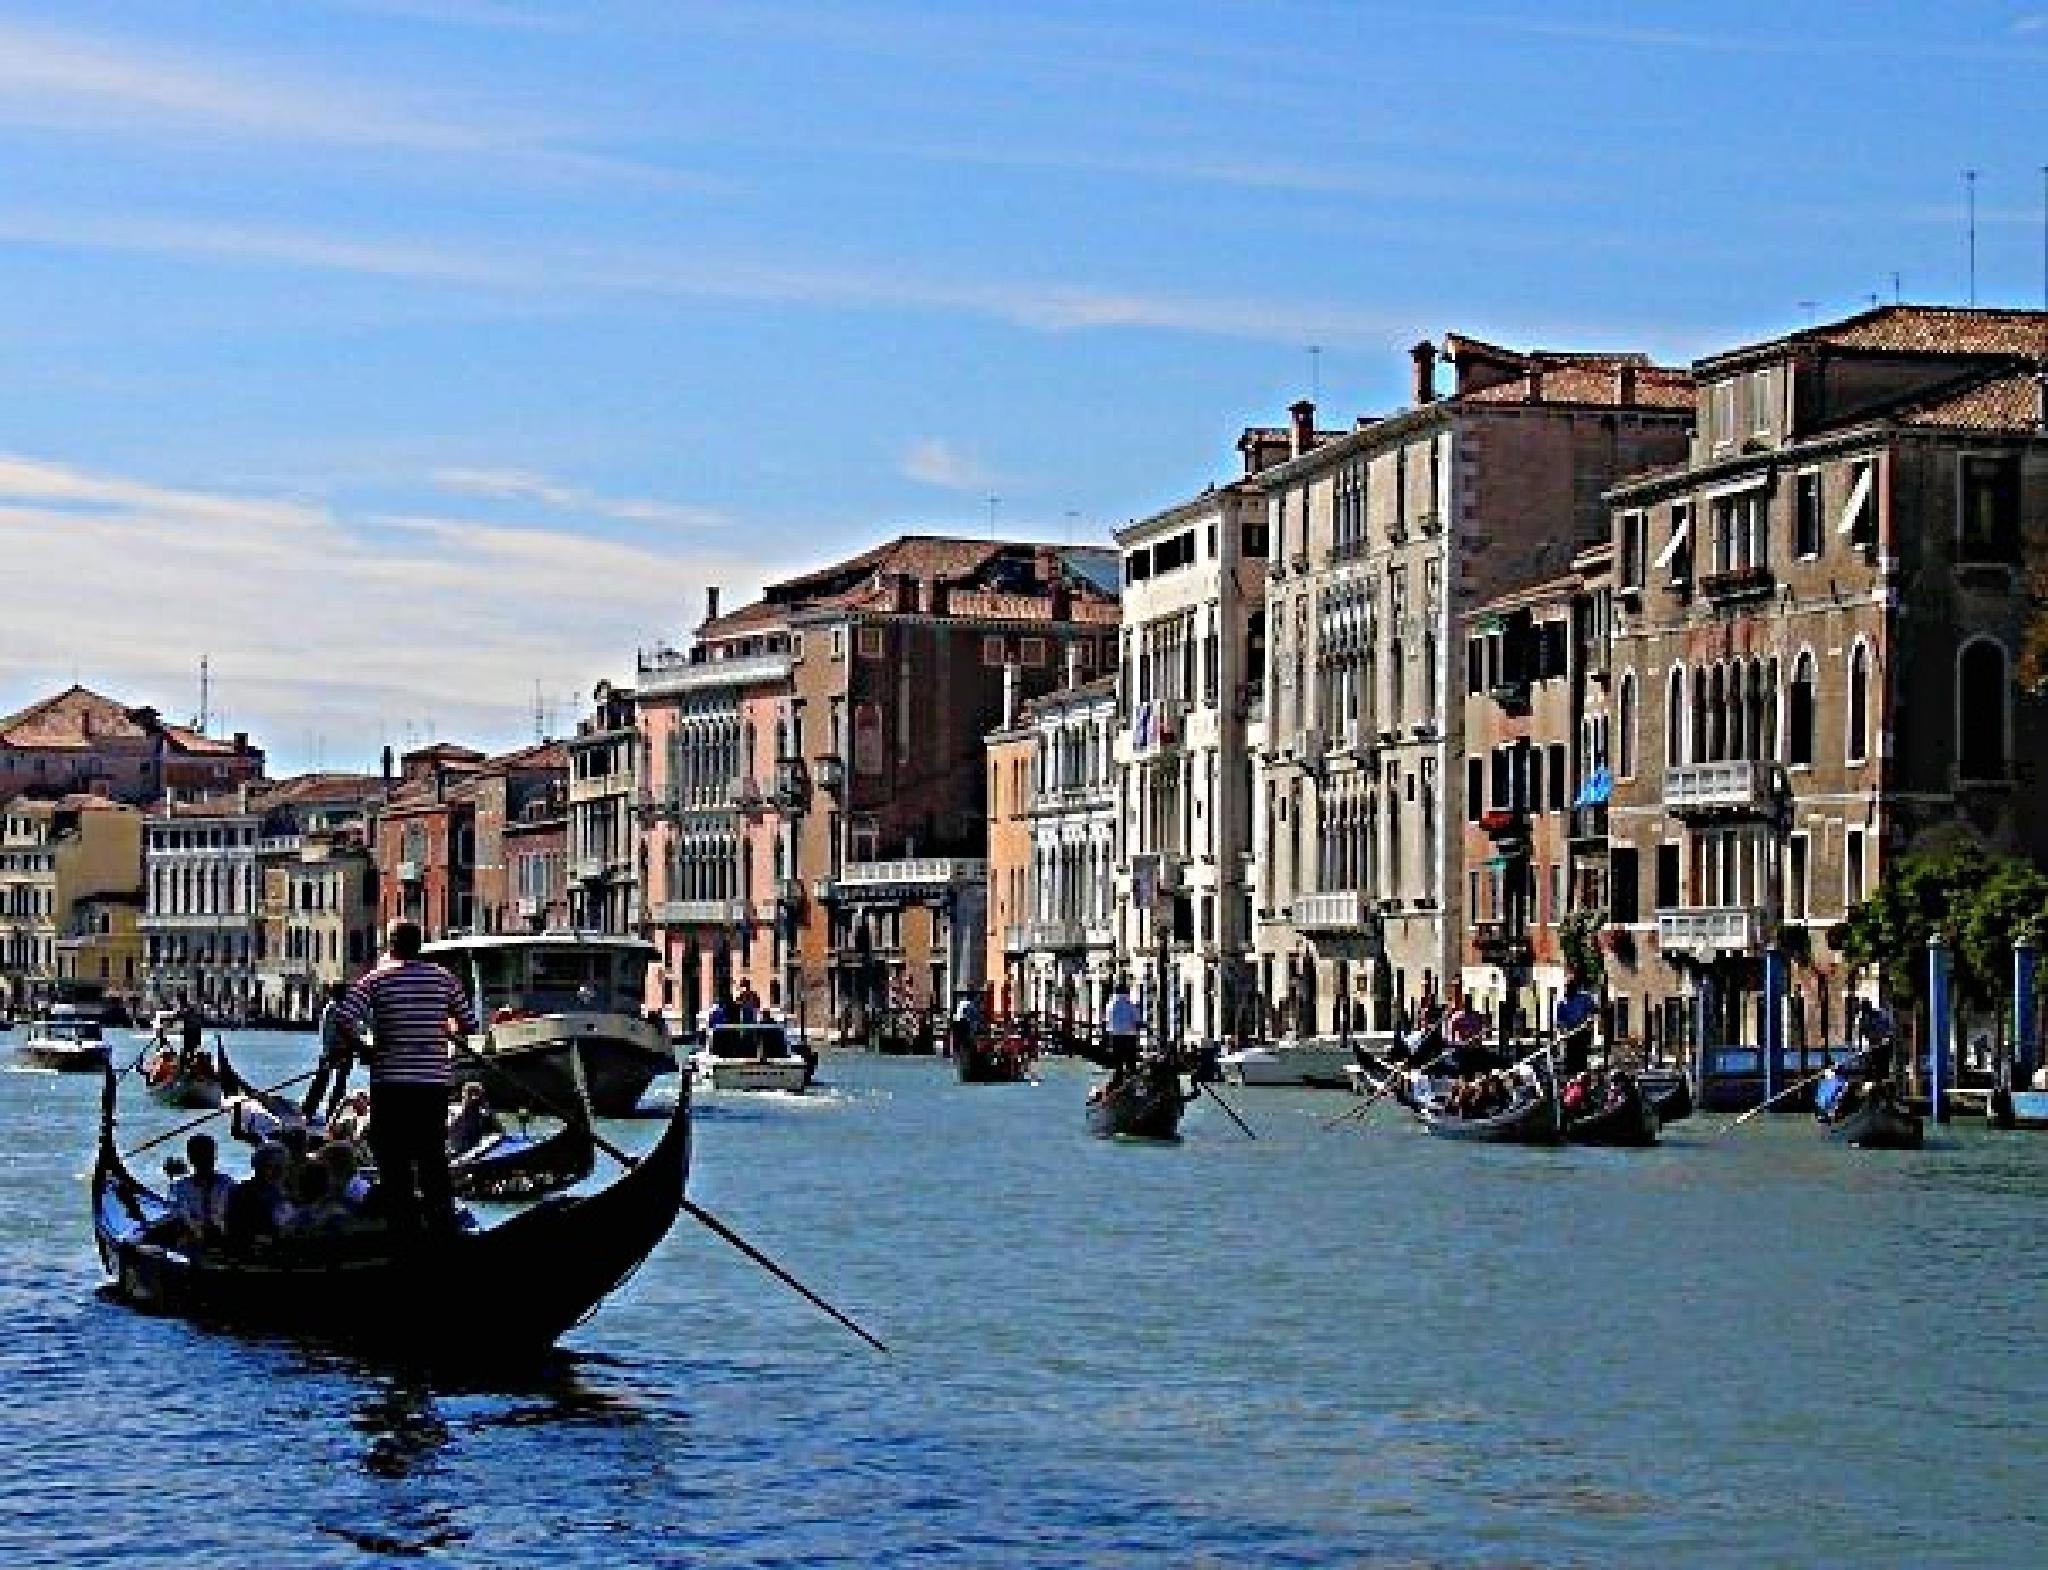 Venice by KarynG